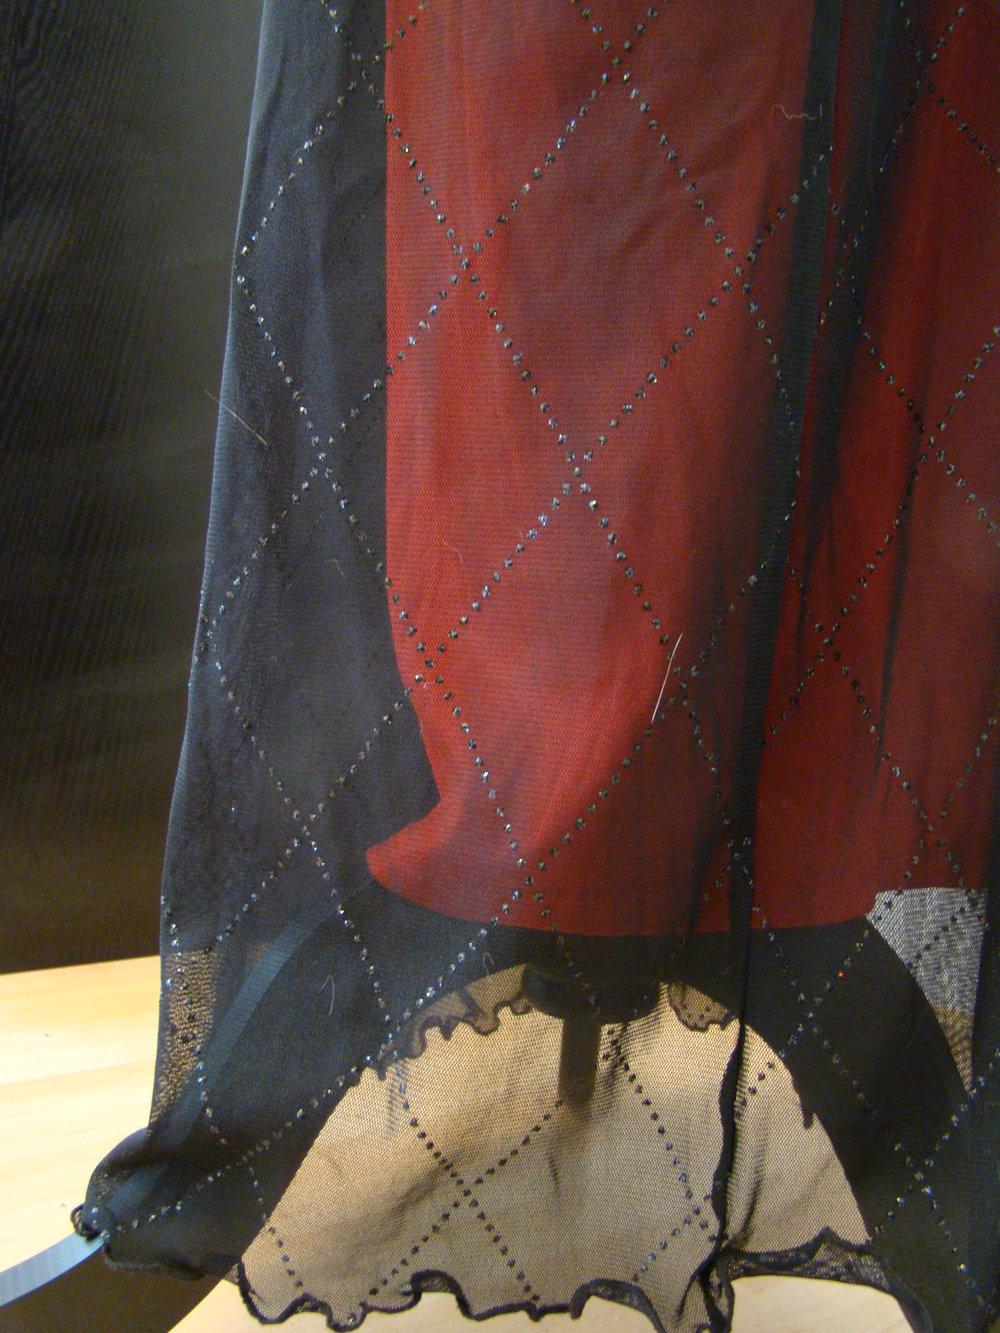 Bodenlanger Rock, Spitze, Glitzer, edel rot schwarz, Bordeaurot 34   36 XS  ... fb3960b274